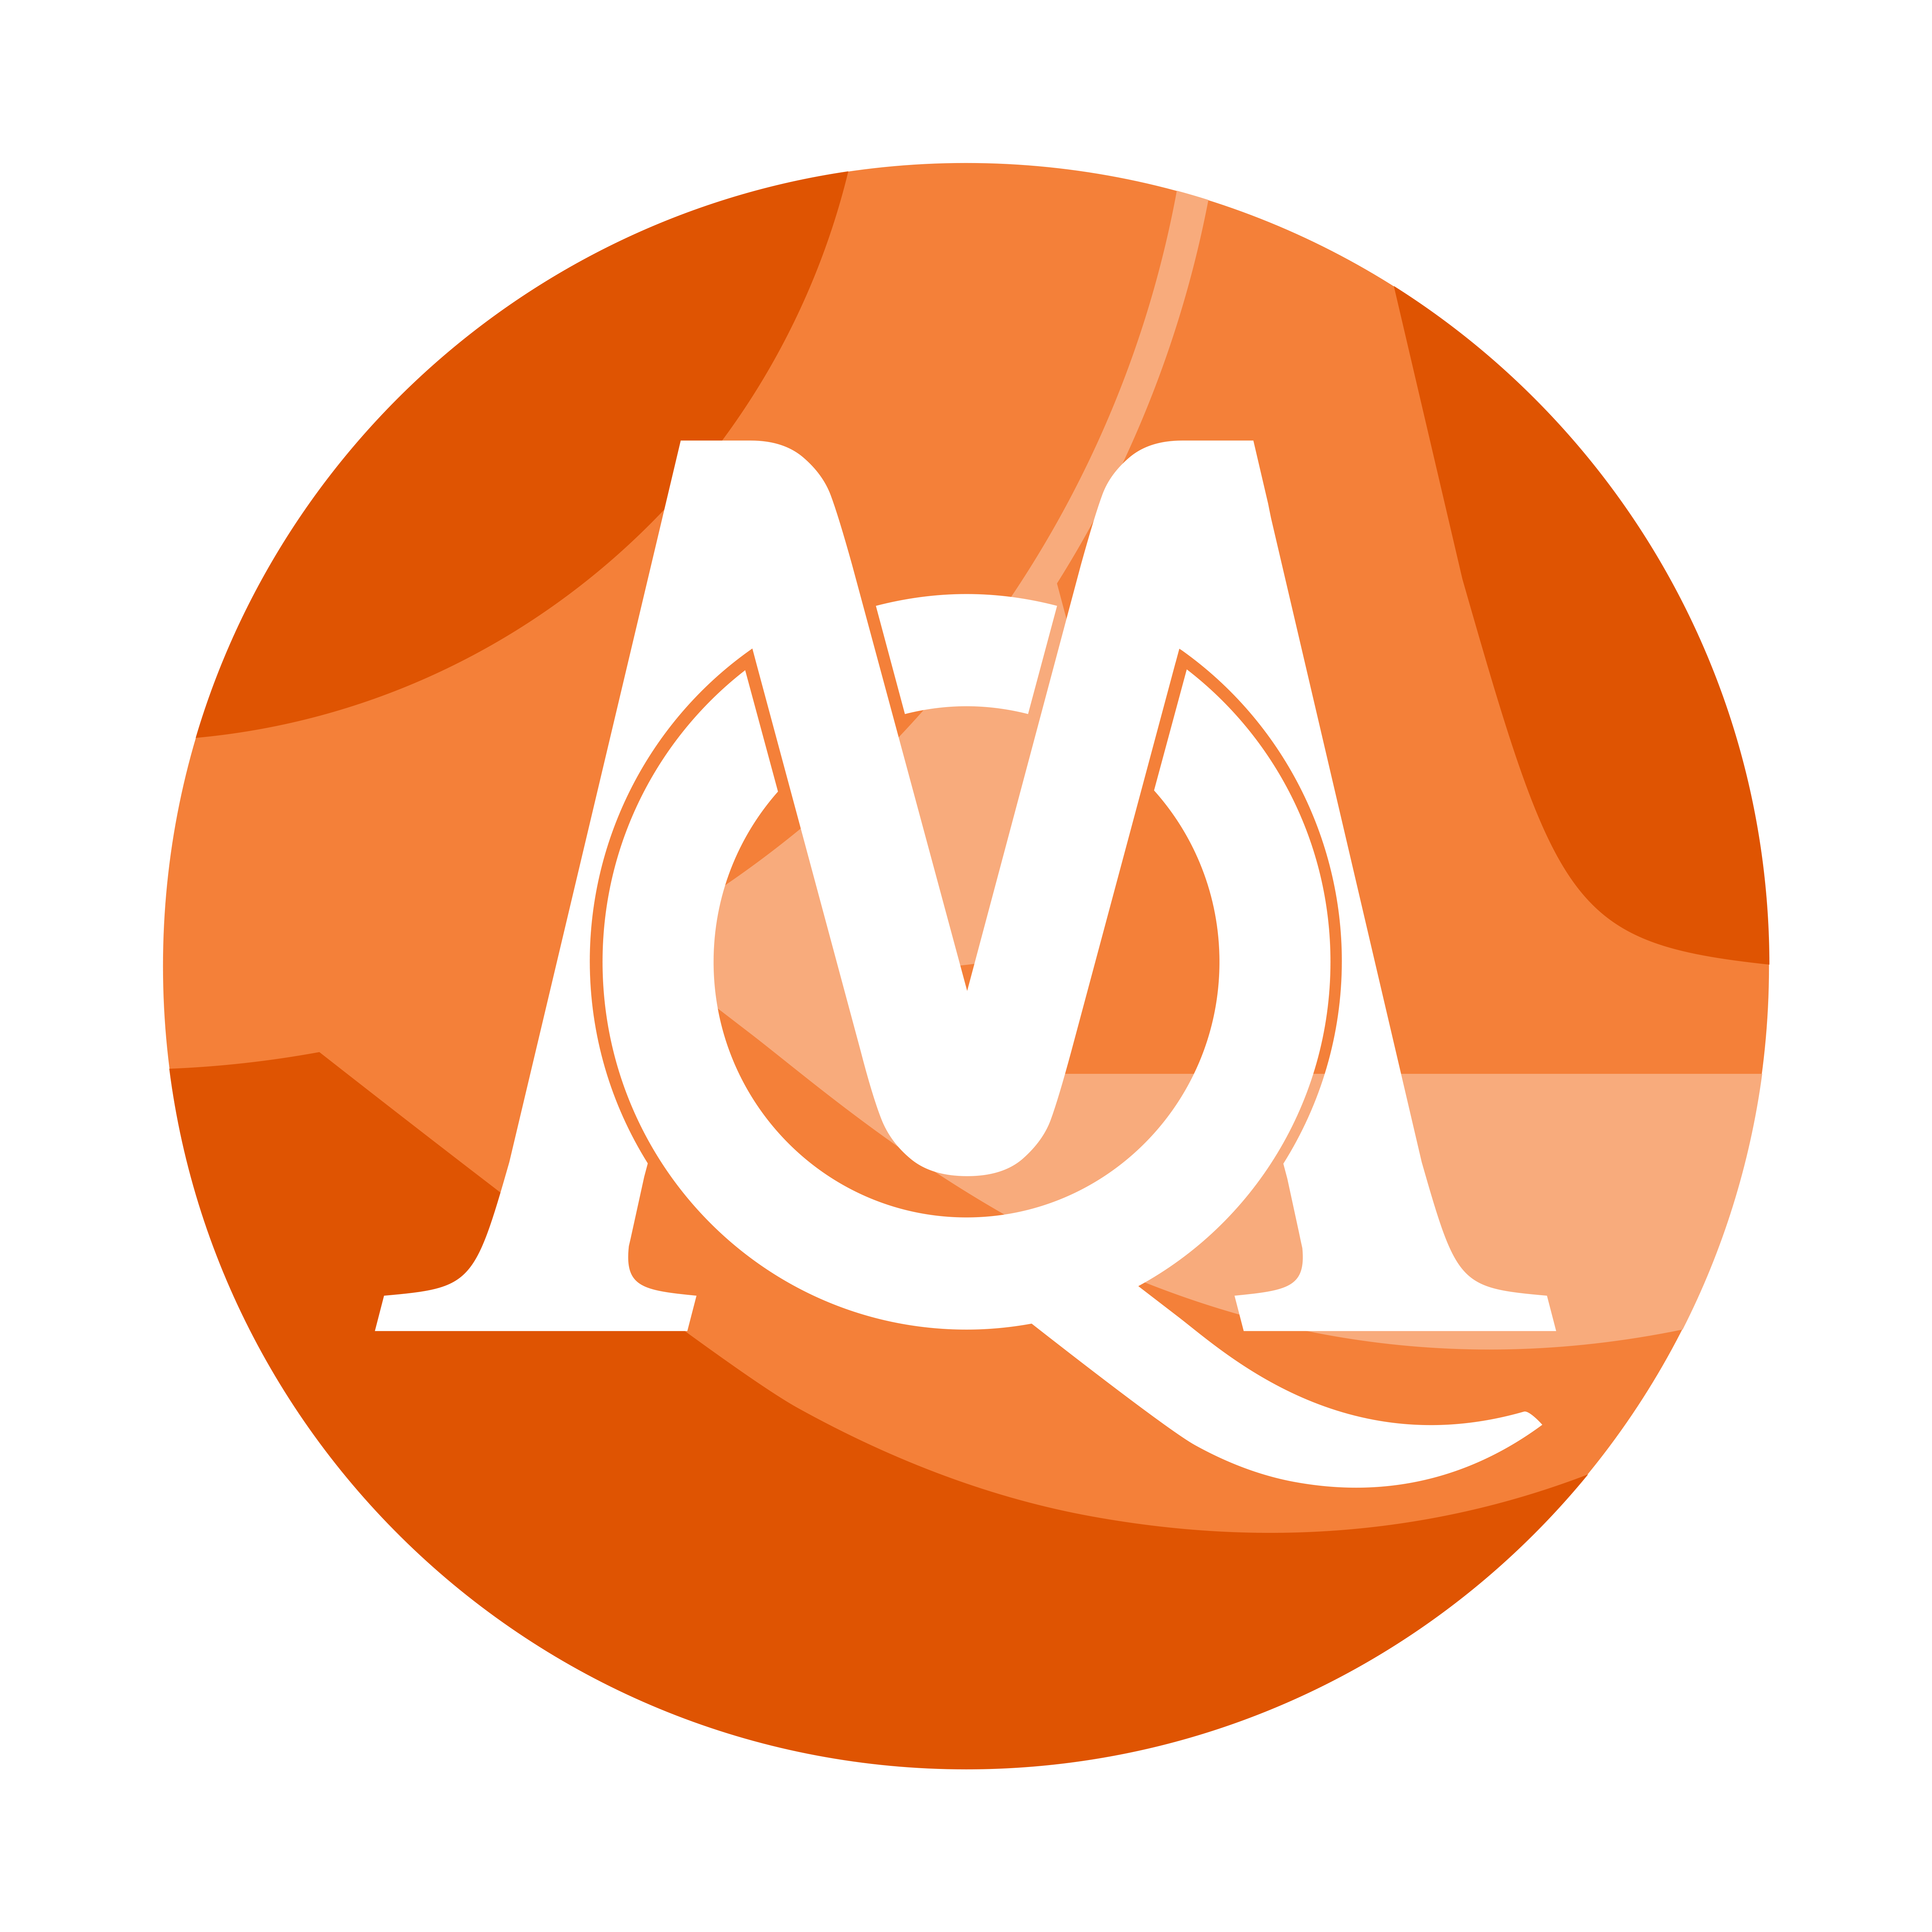 MAXQDA Reader - a free MAXQDA project reader